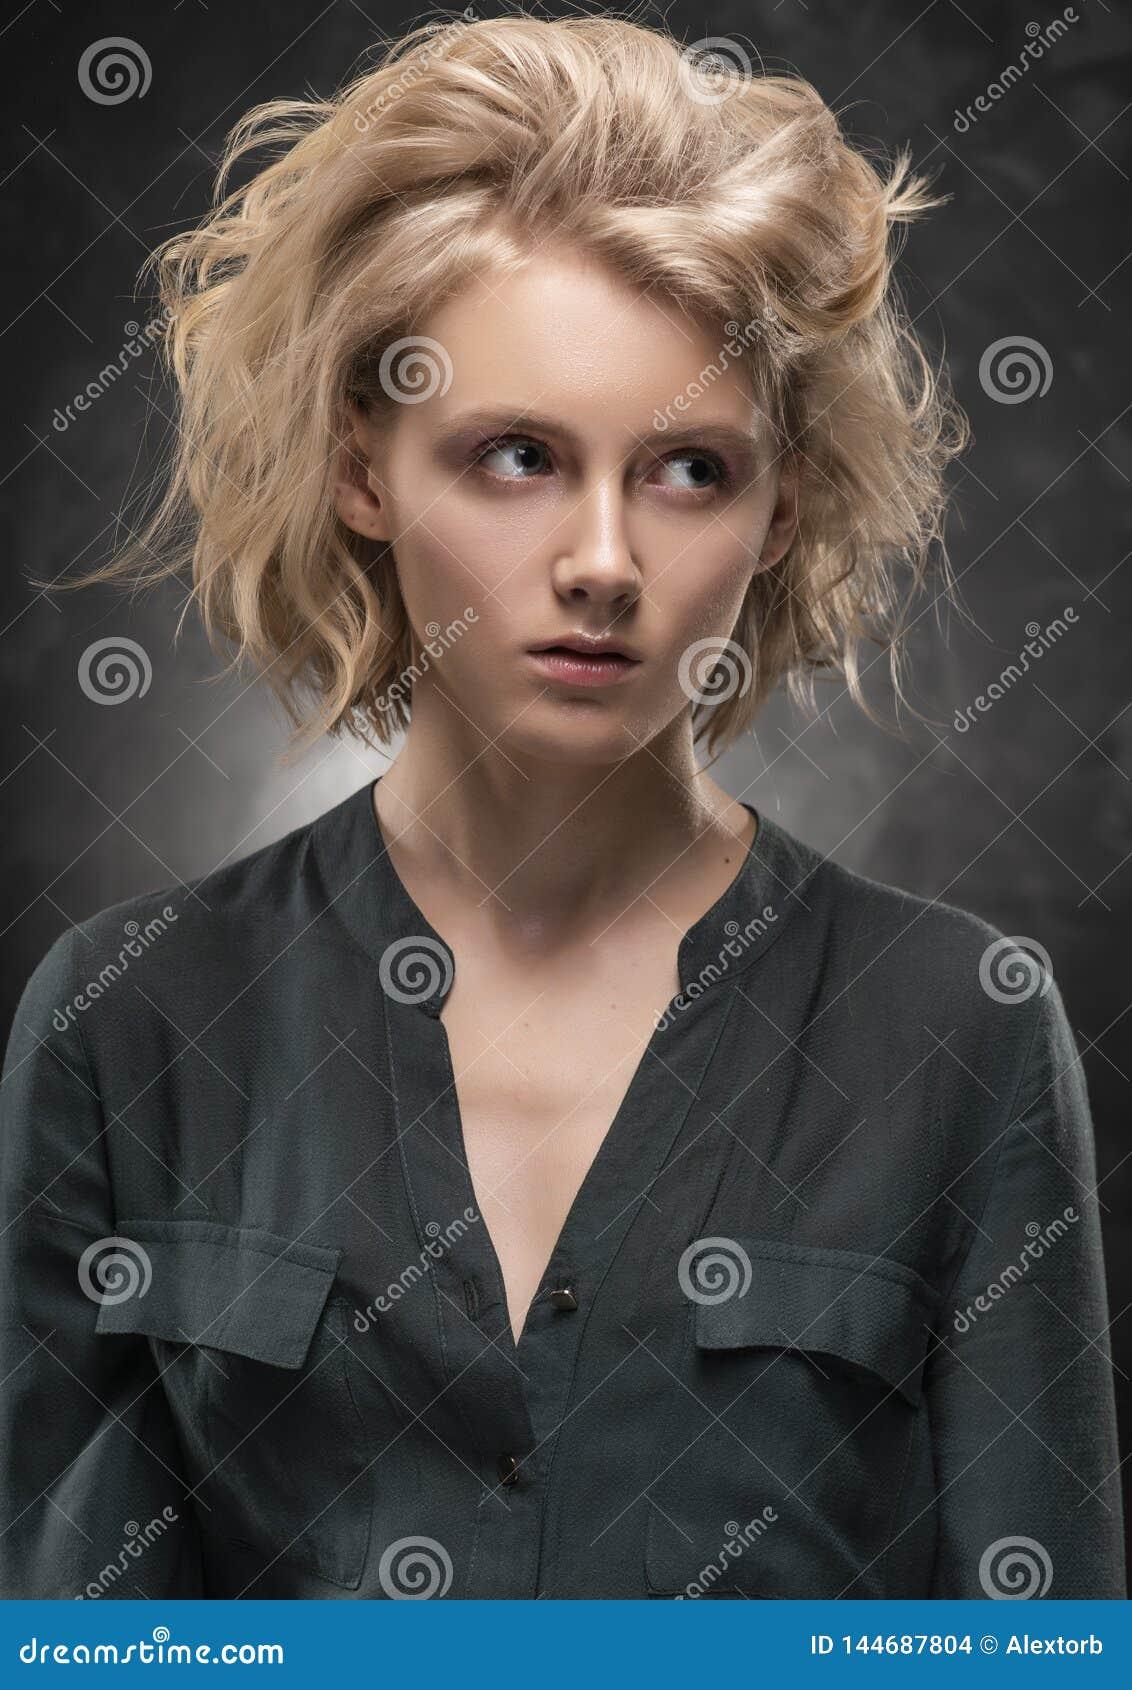 Serious Pretty Nude Blonde Posing Stock Photo - Image of